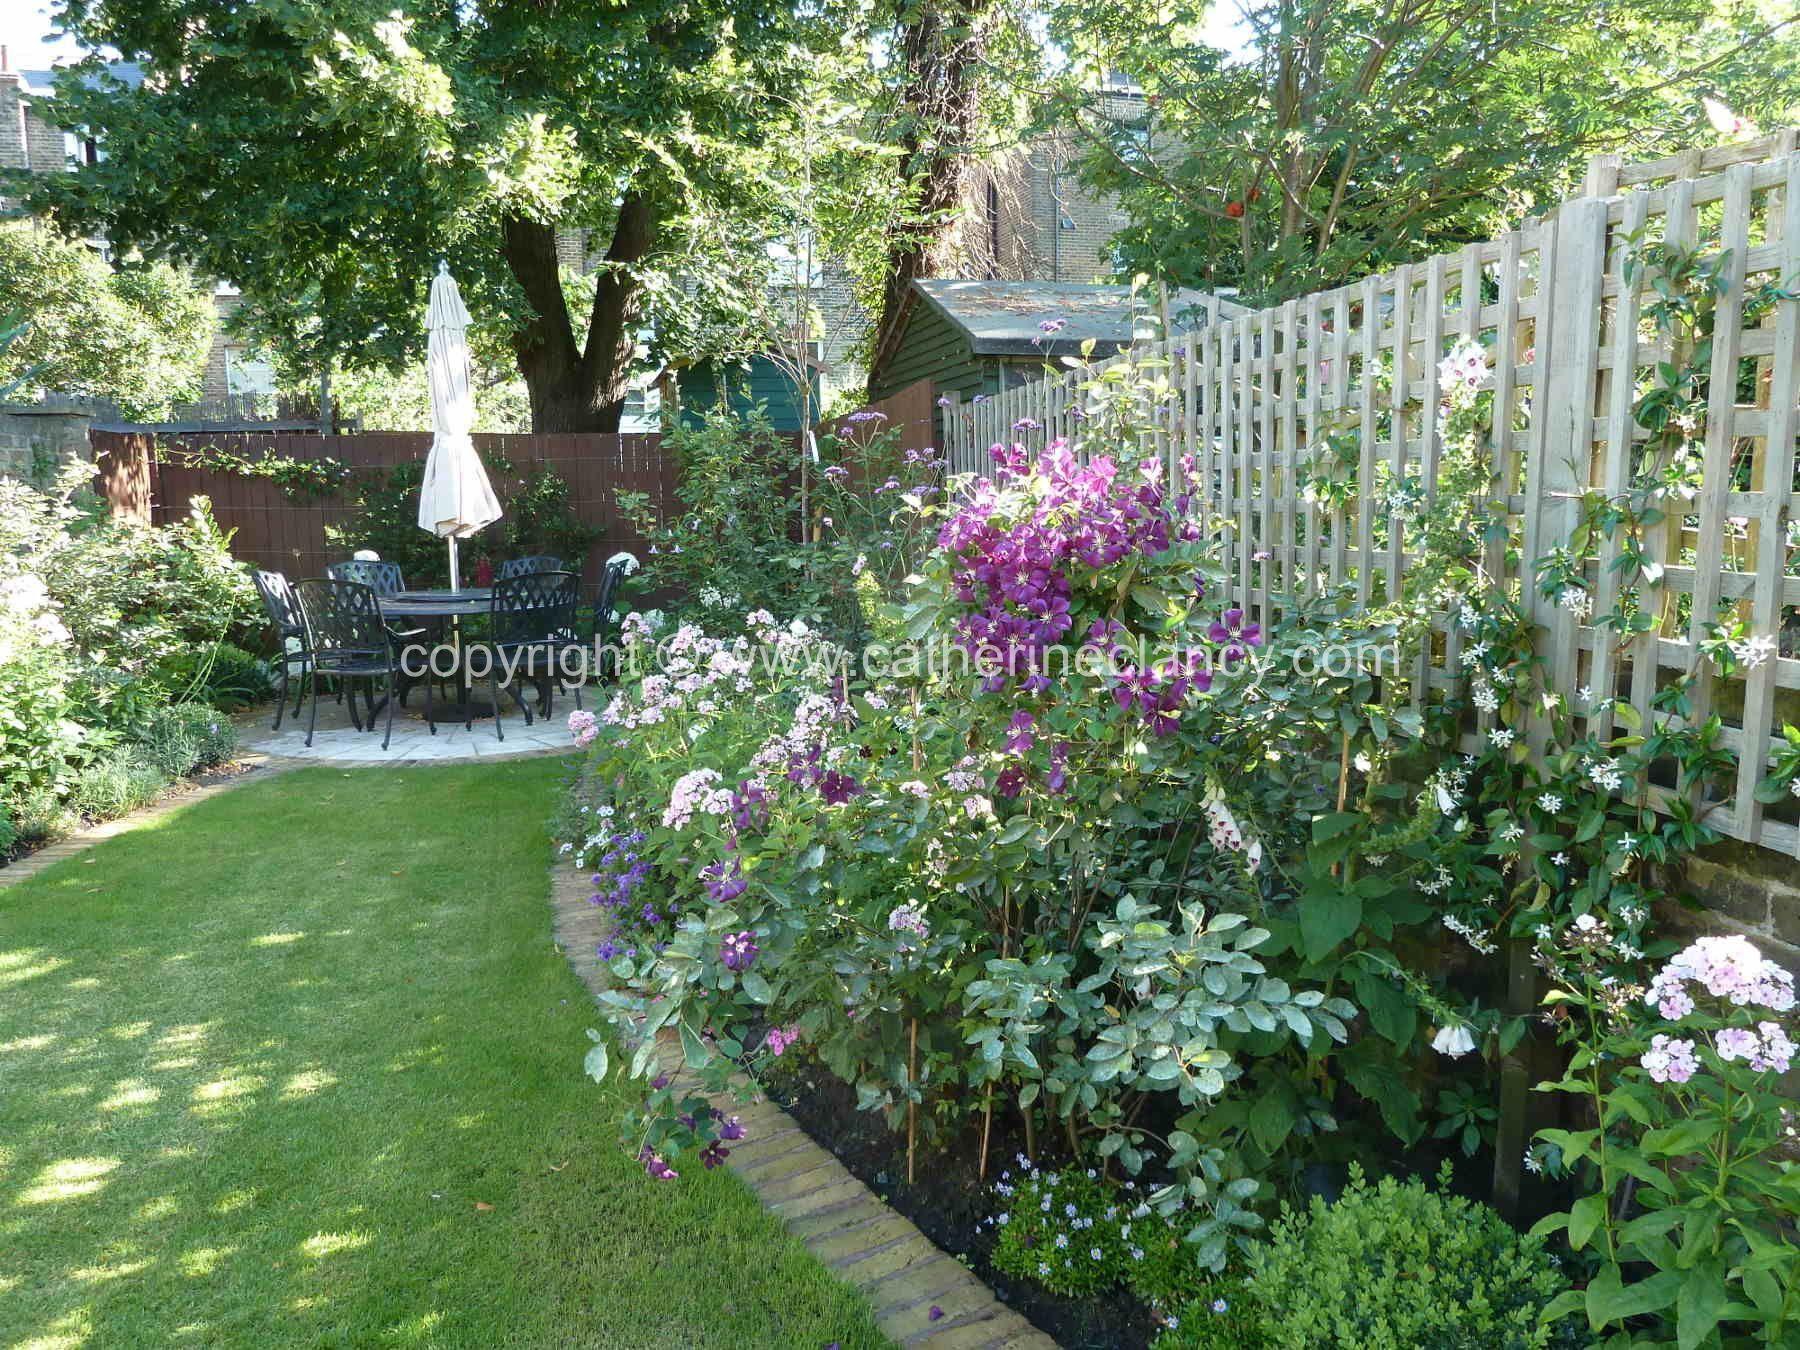 Victorian North Facing Garden By Blackheath Based Garden Designer Catherine Clancy Msgd The Ea In 2020 North Facing Garden Garden Design London Front Garden Design